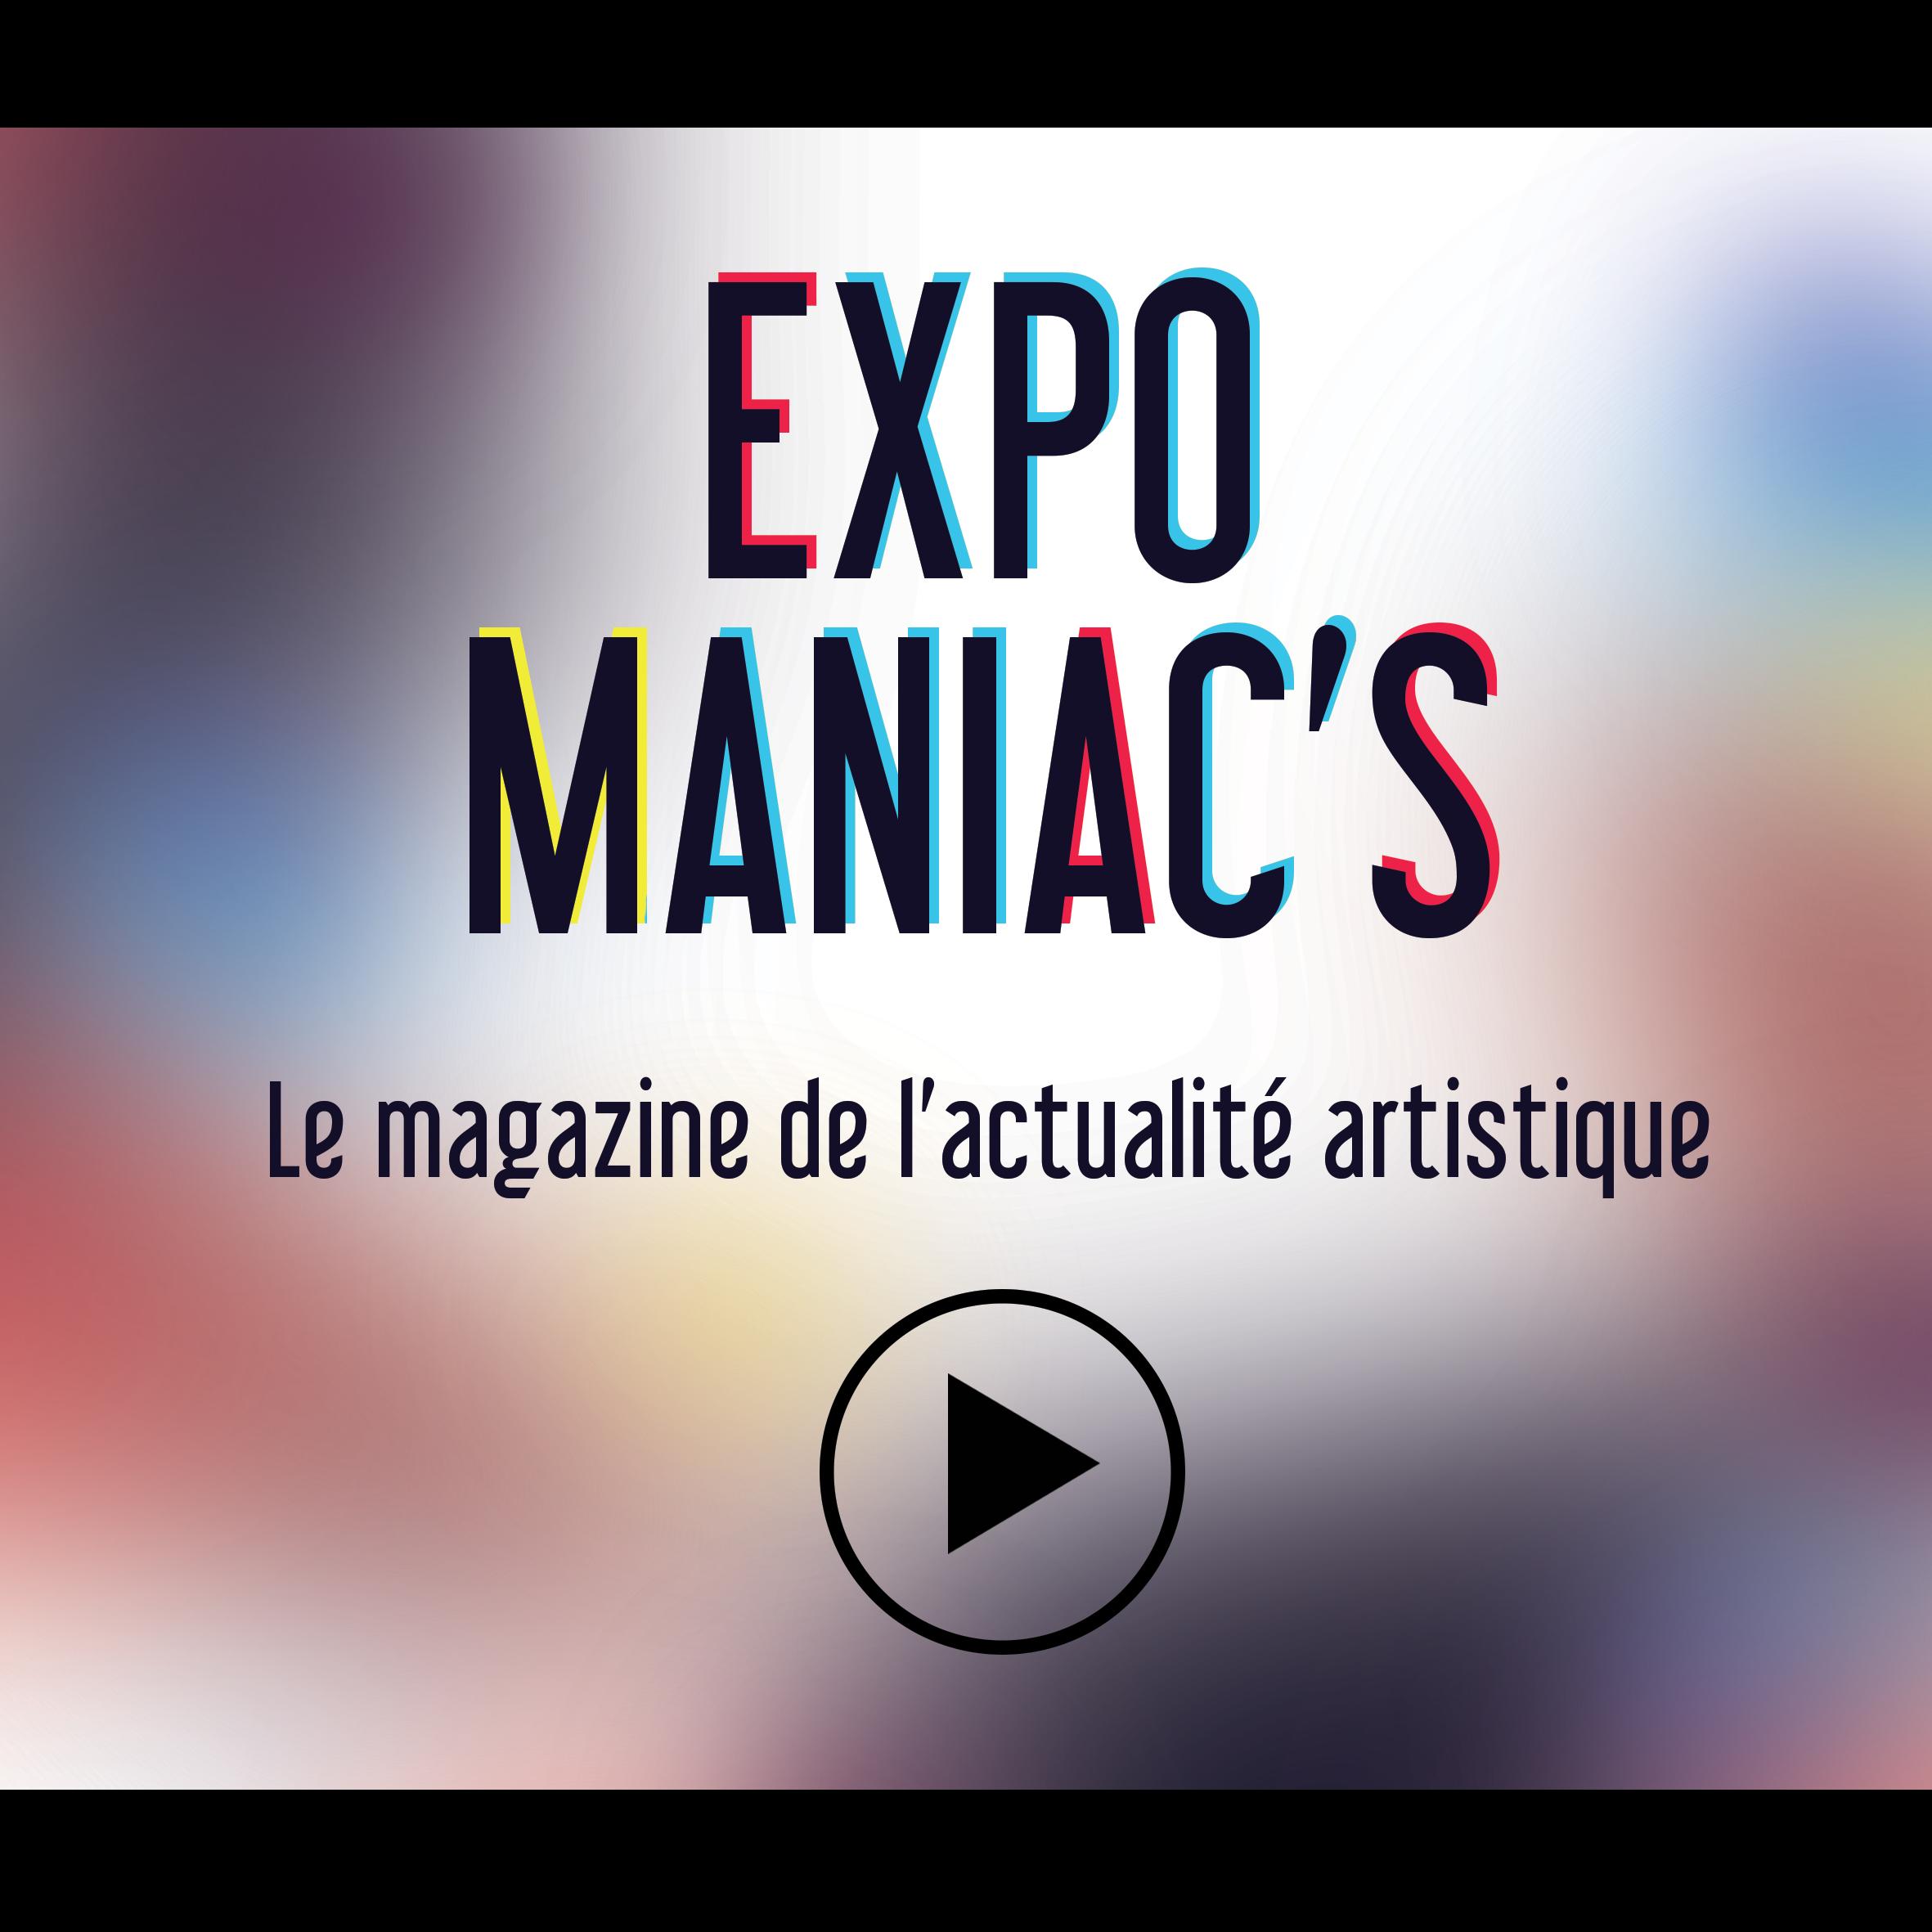 expo maniac's